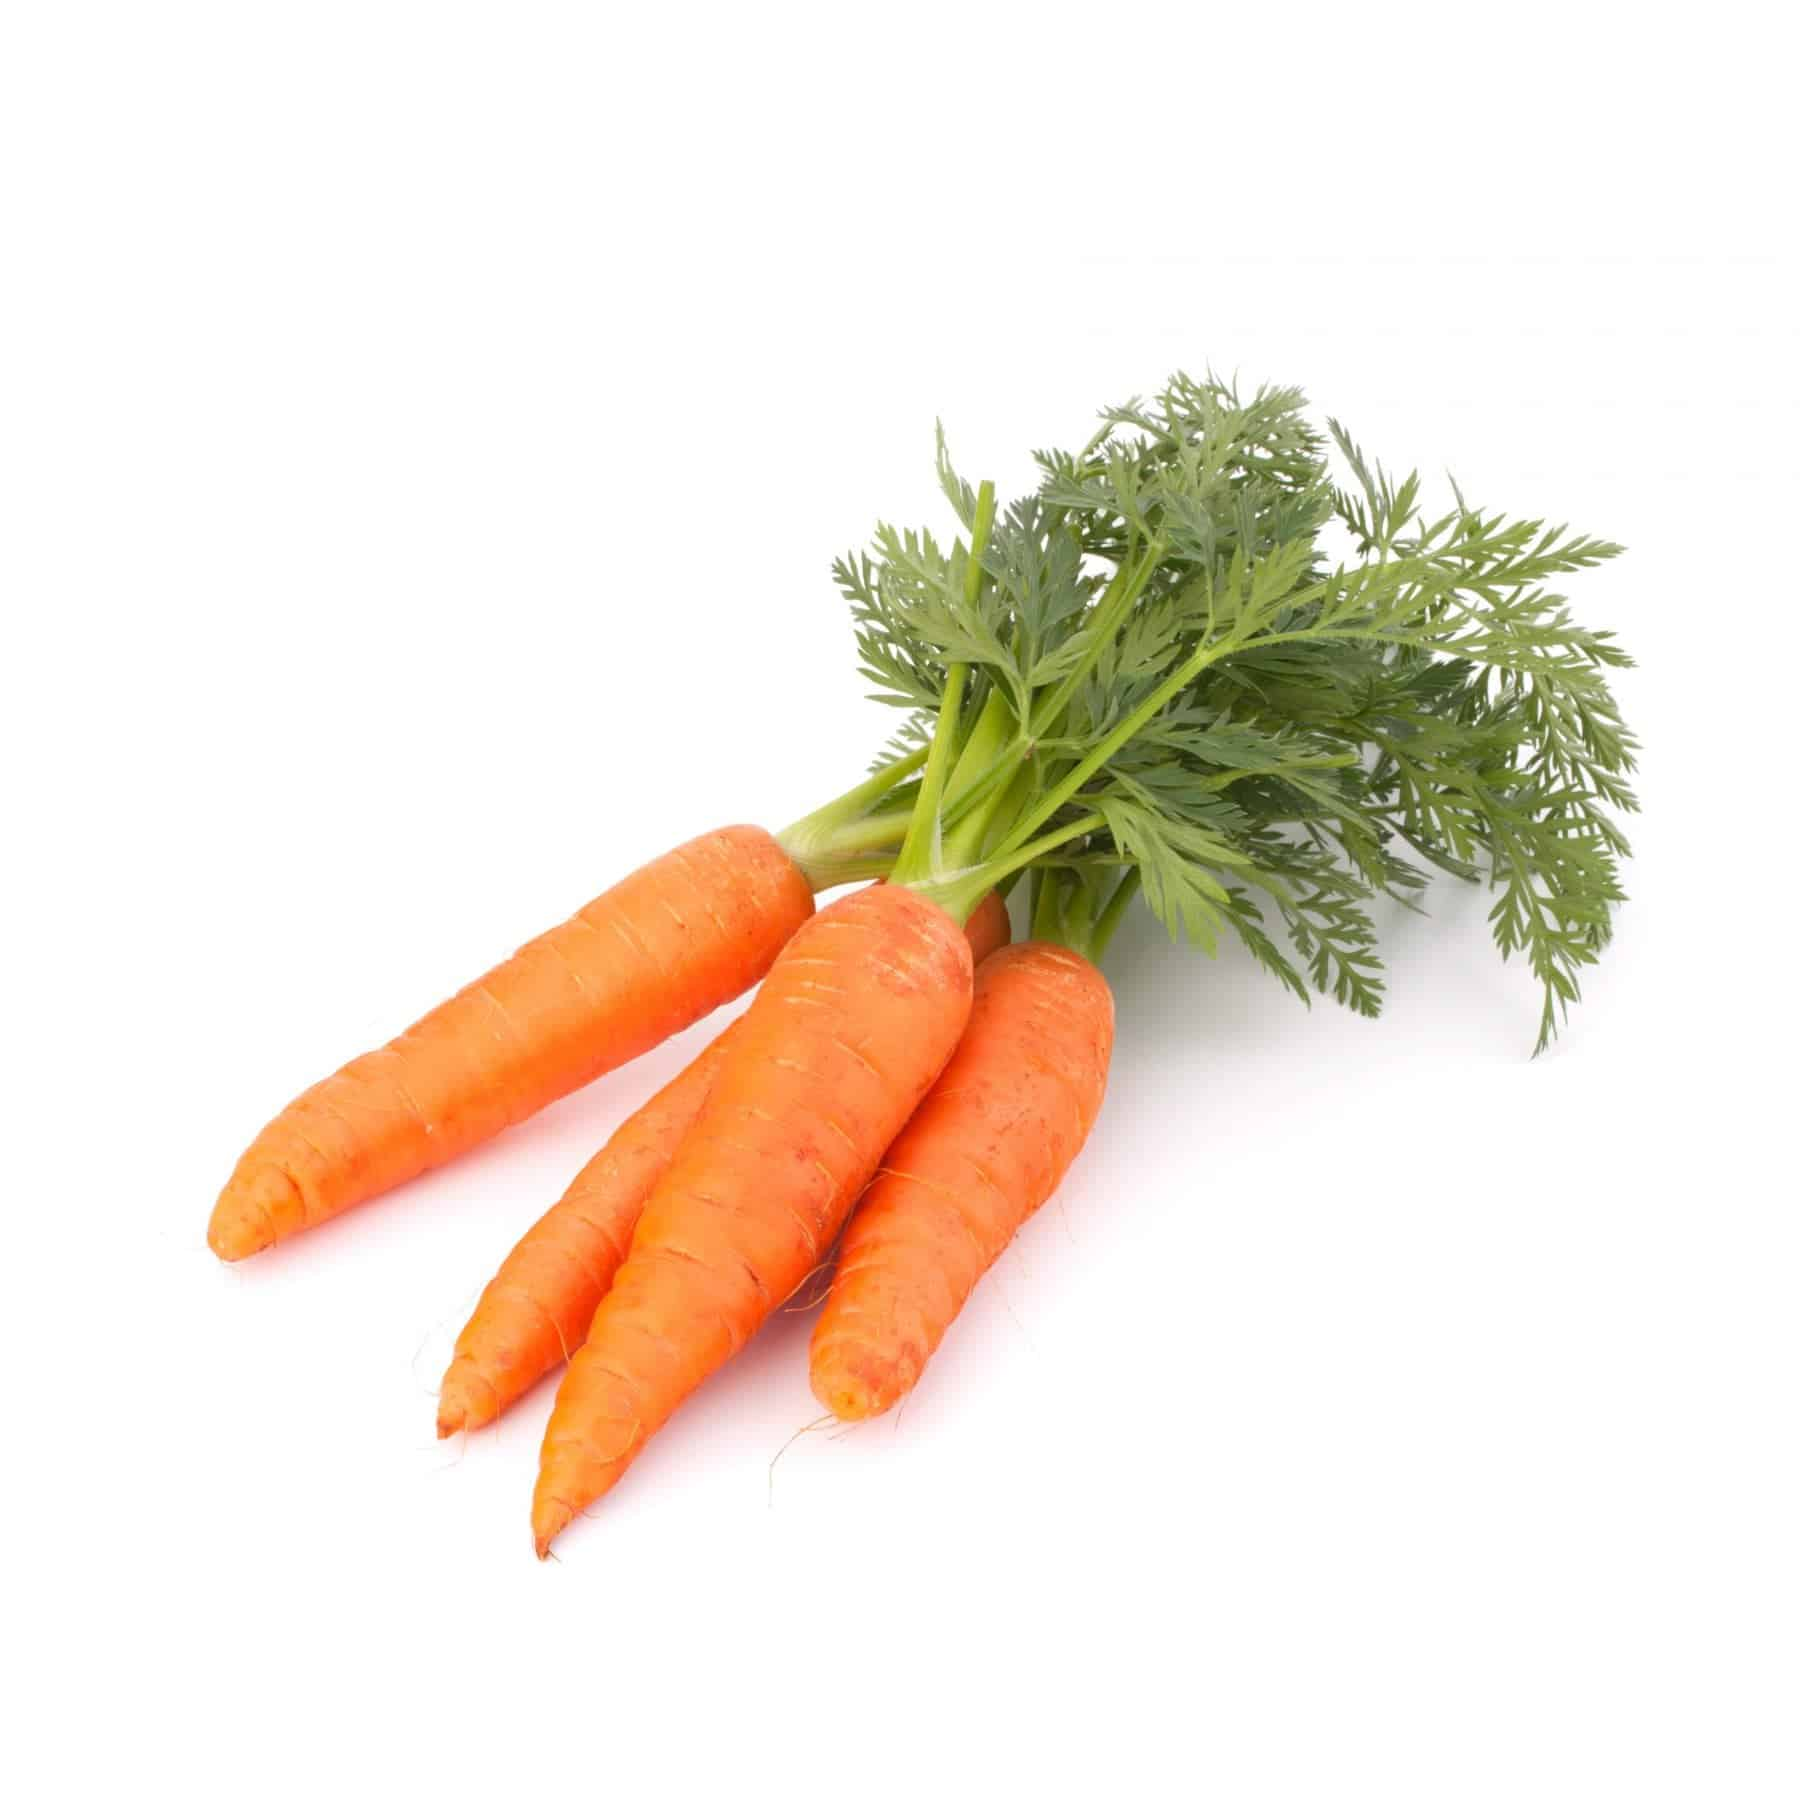 Carrots M Hughes And Sons Llandudno